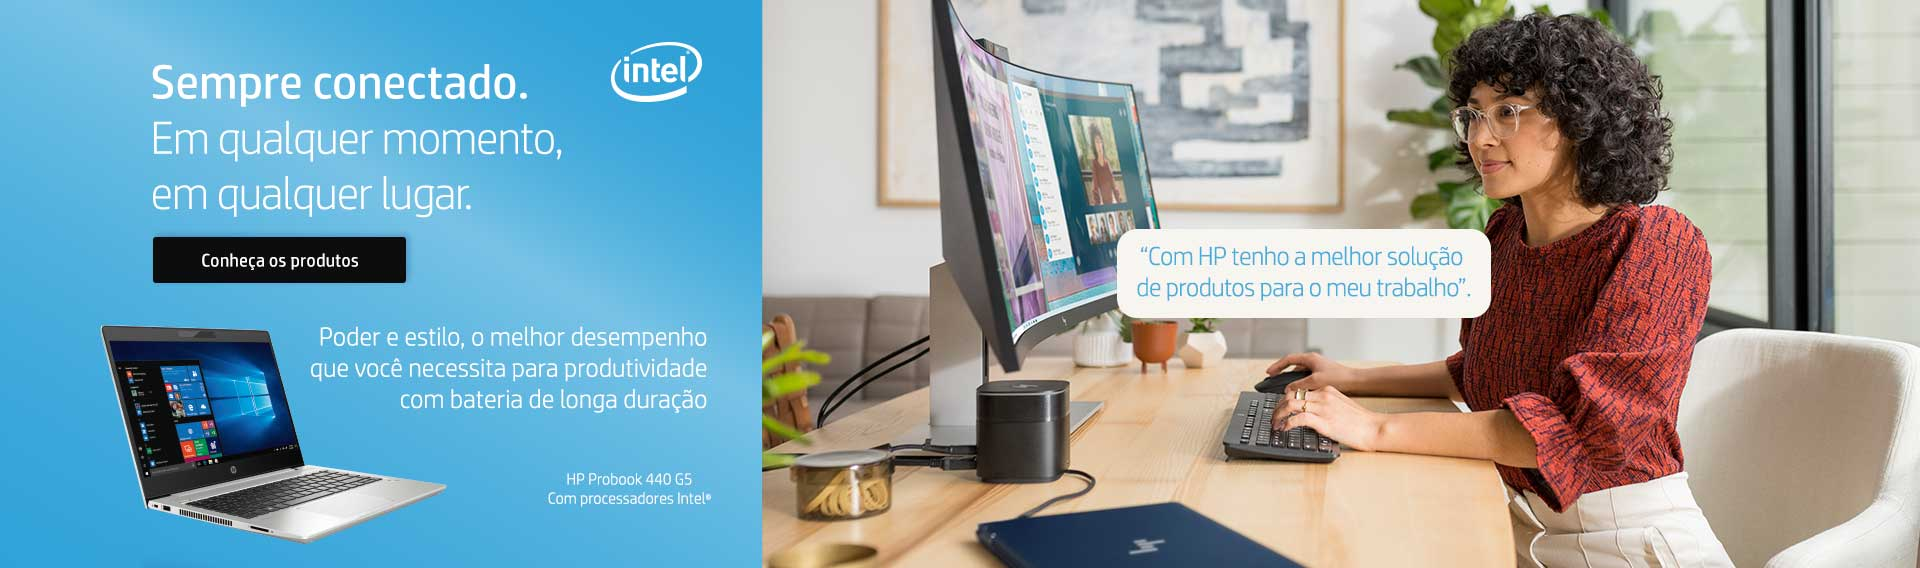 Sempre conectado com Intel